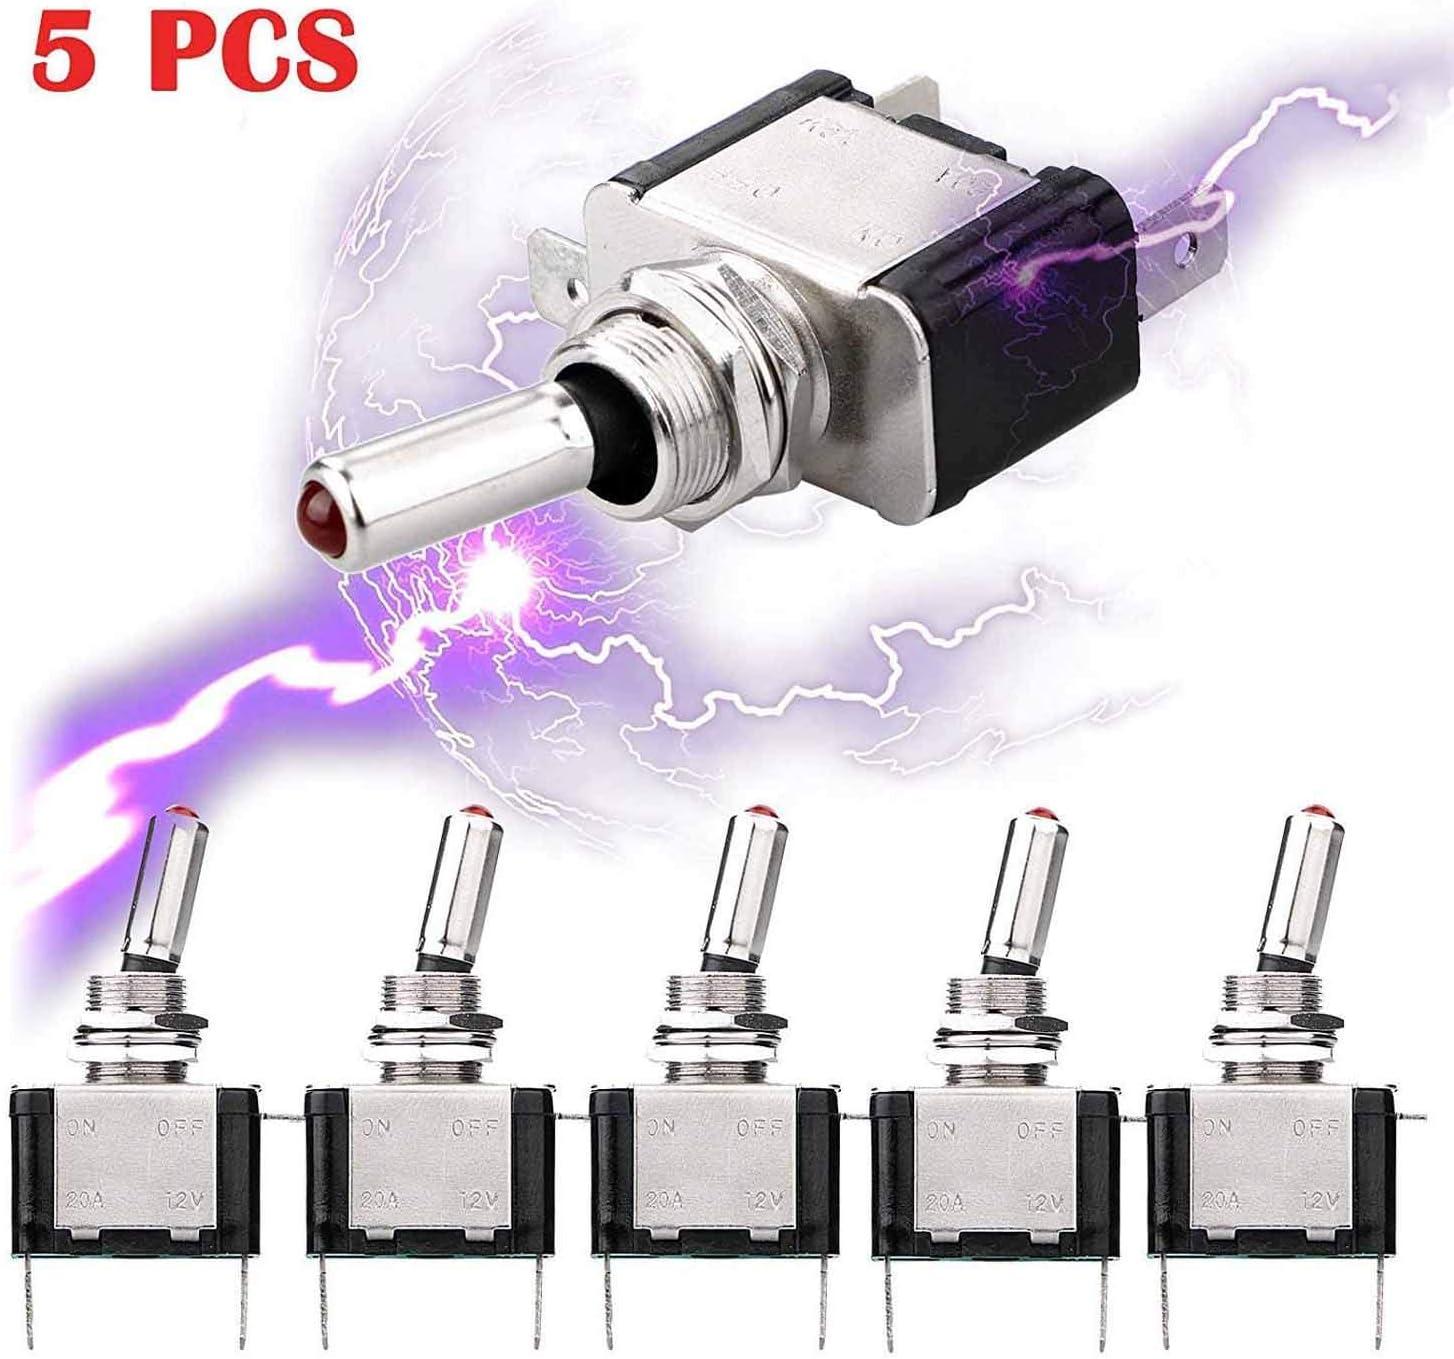 5pcs SPST LED Lighted Rocker Toggle Switch Linkstyle Marine Toggle Switch, On-Off LED Toggle Switch 12V 20A for Car RV Vehicles Truck Boat: Automotive